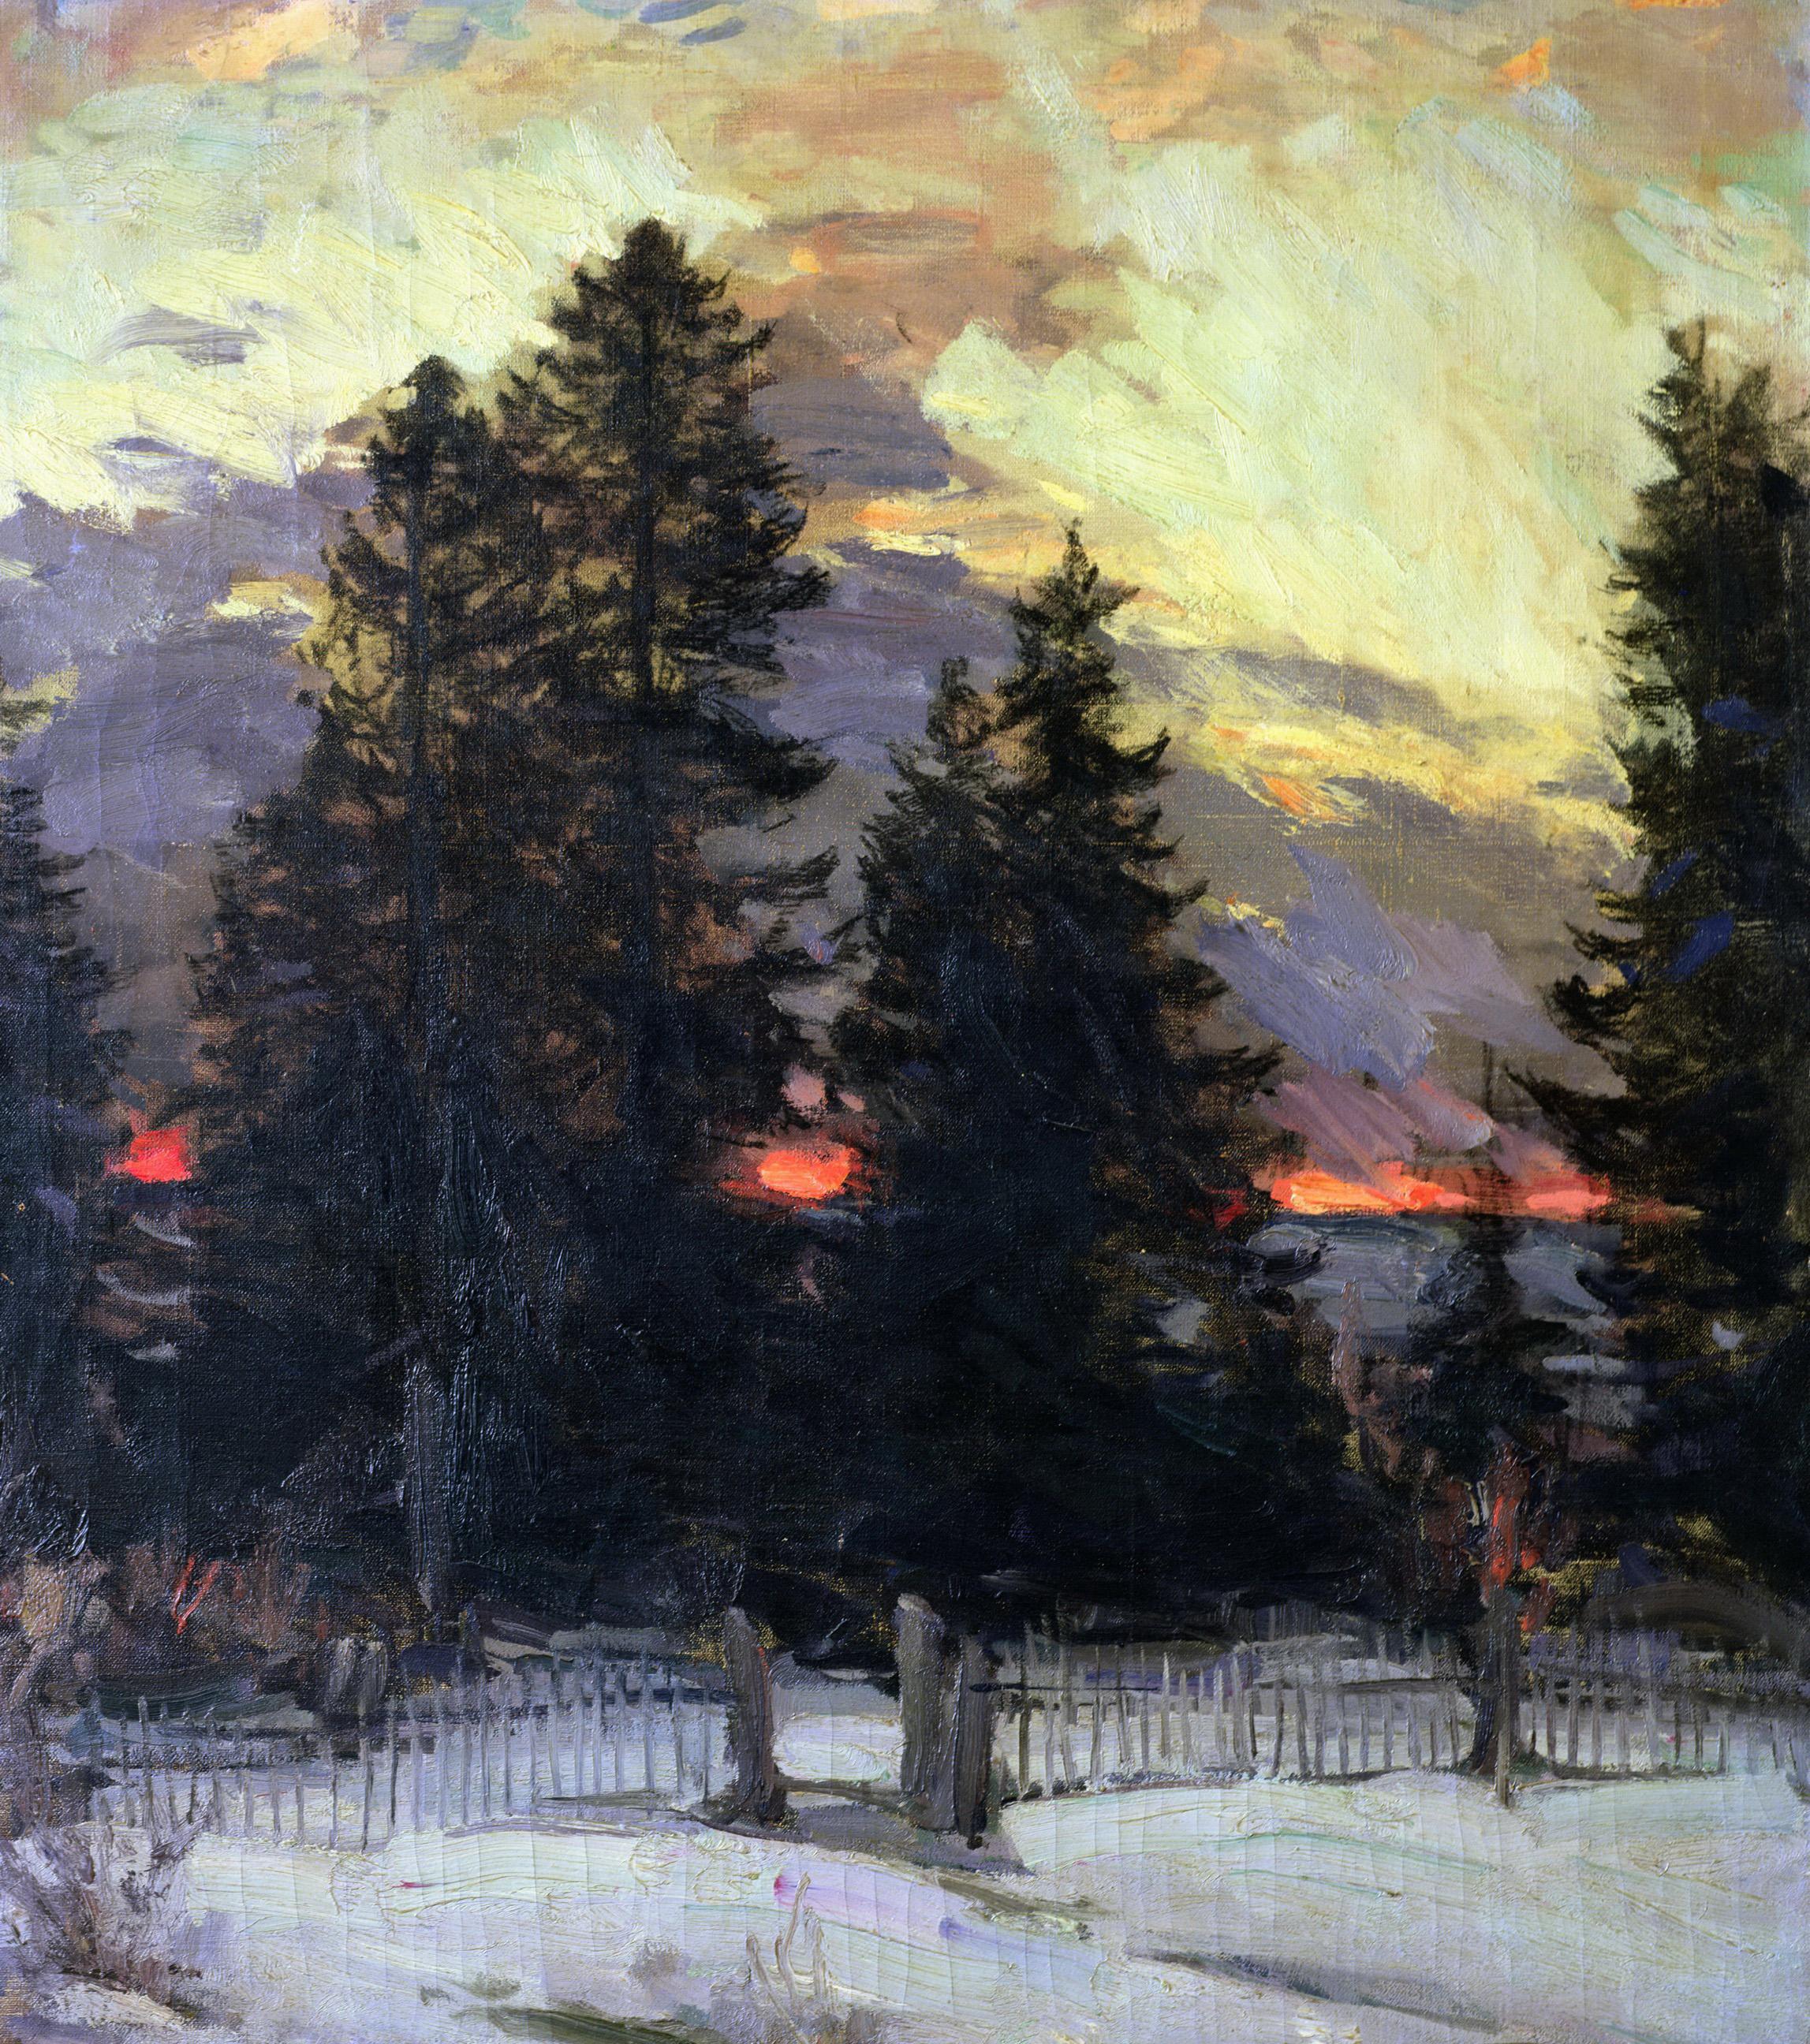 Архипов Абрам картина Закат Зимний пейзаж 1902 Coucher de soleil sur un paysage холст масло